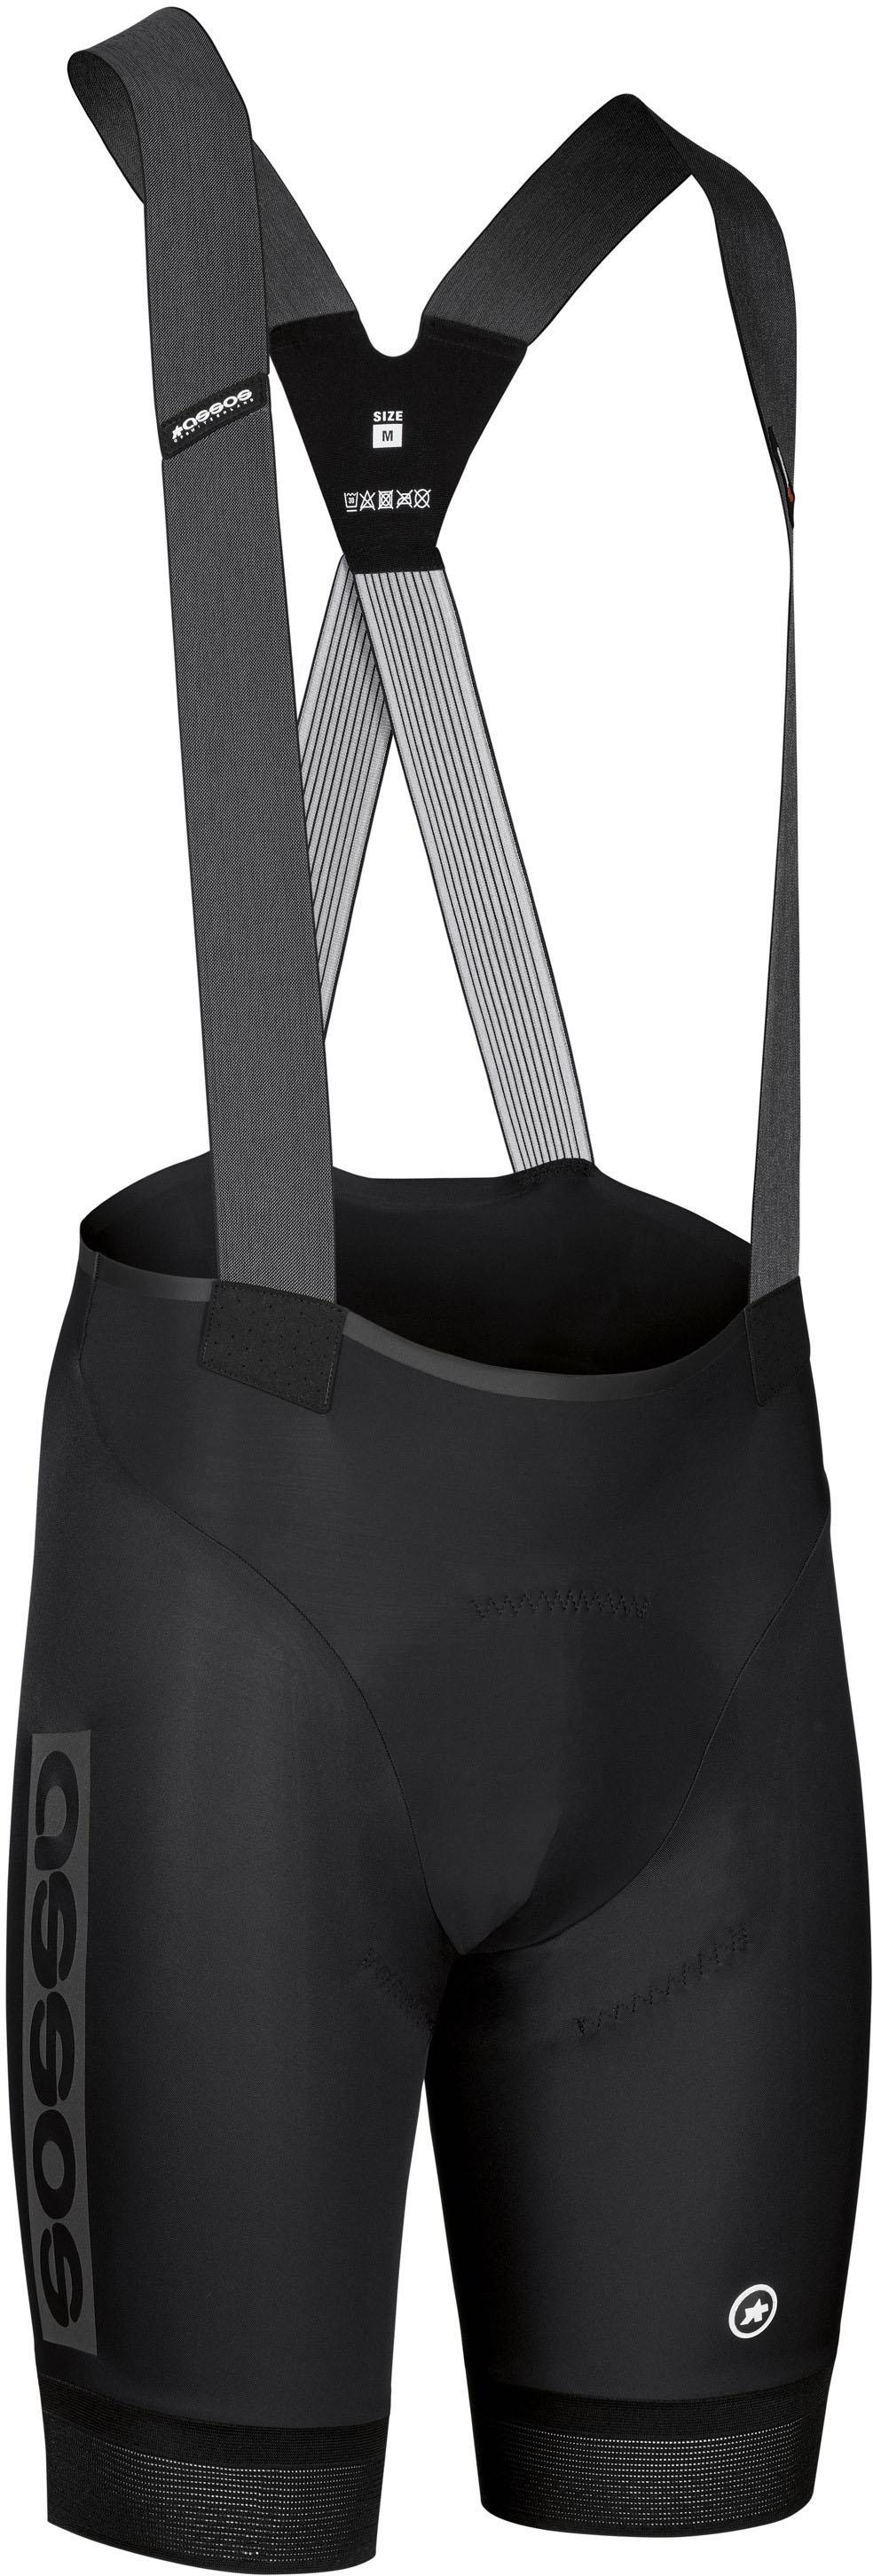 Køb Assos EQUIPE RS Summer Bib Shorts / Cykelbukser S9 Werksteam – Sort